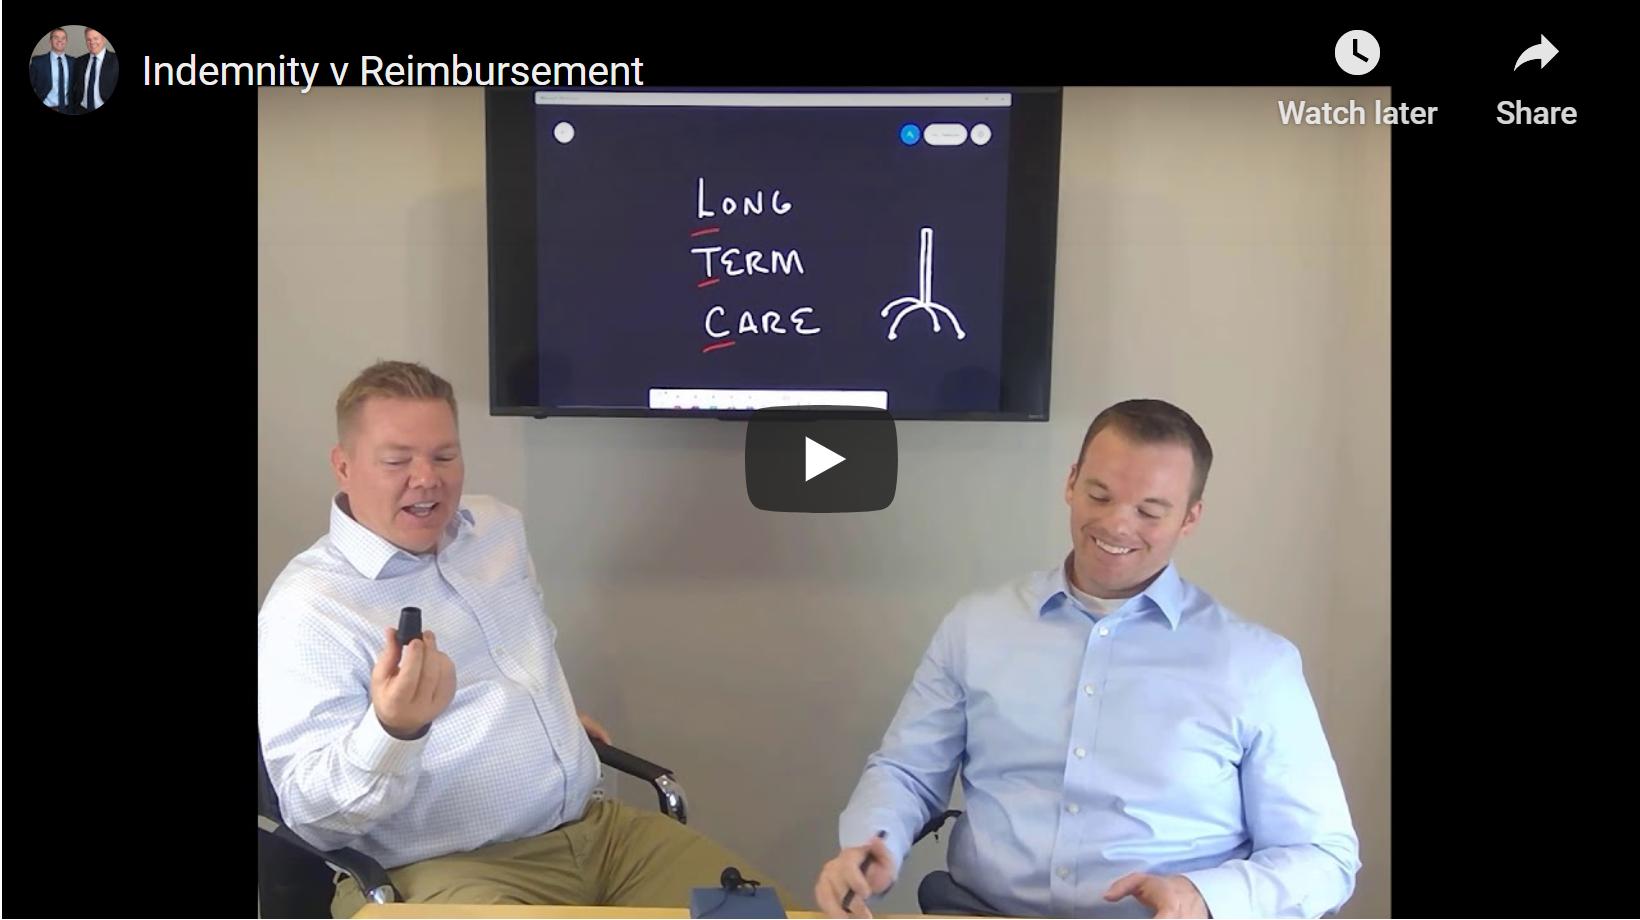 Long Term Care, Part II:  Indemnity v. Reimbursement Thumbnail